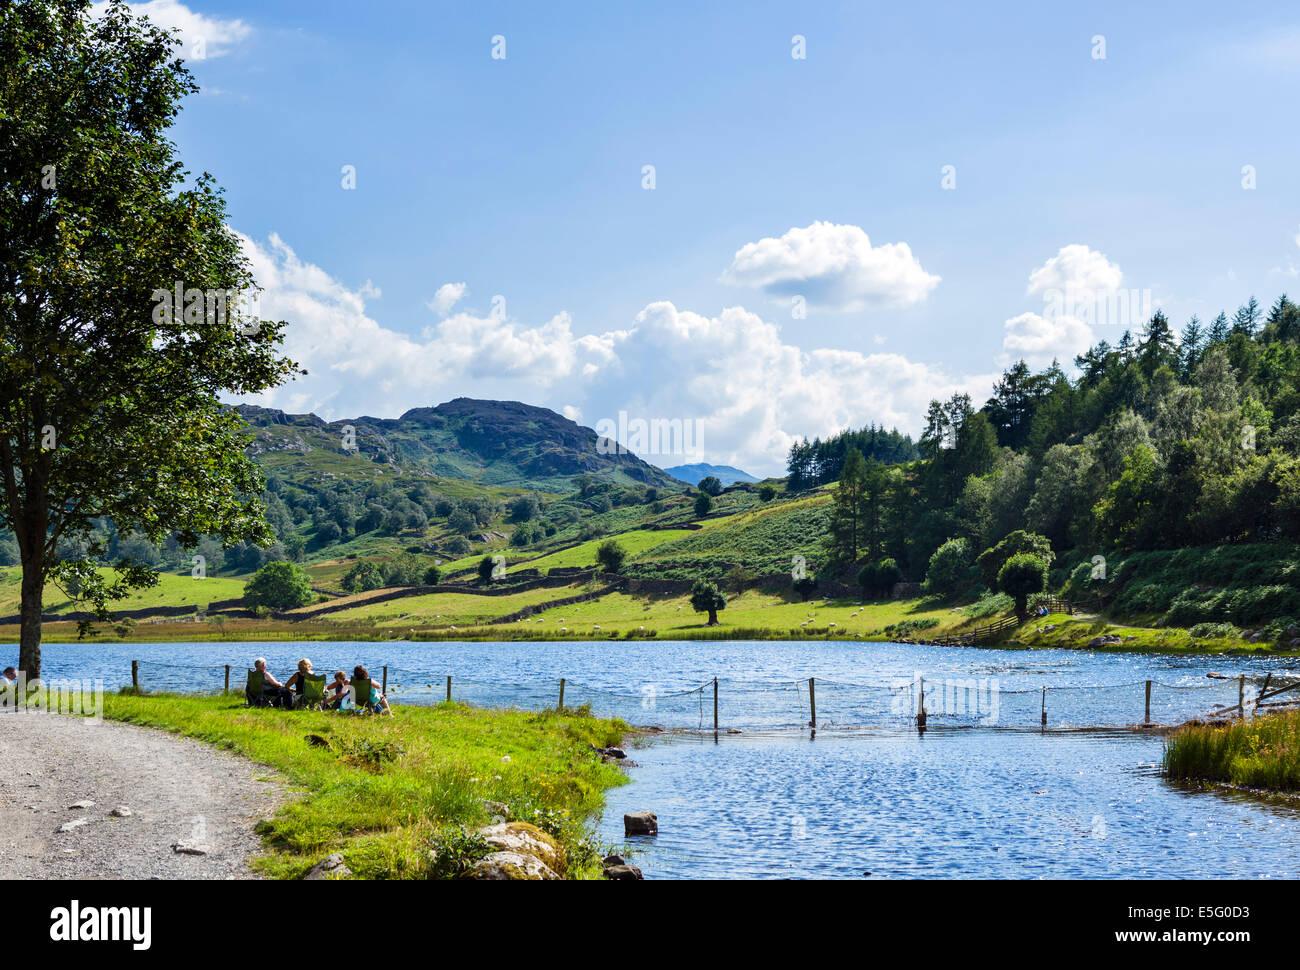 People picnicking by the side of Watendlath Beck, Watendlath Tarn, Borrowdale, Lake District, Cumbria, UK - Stock Image